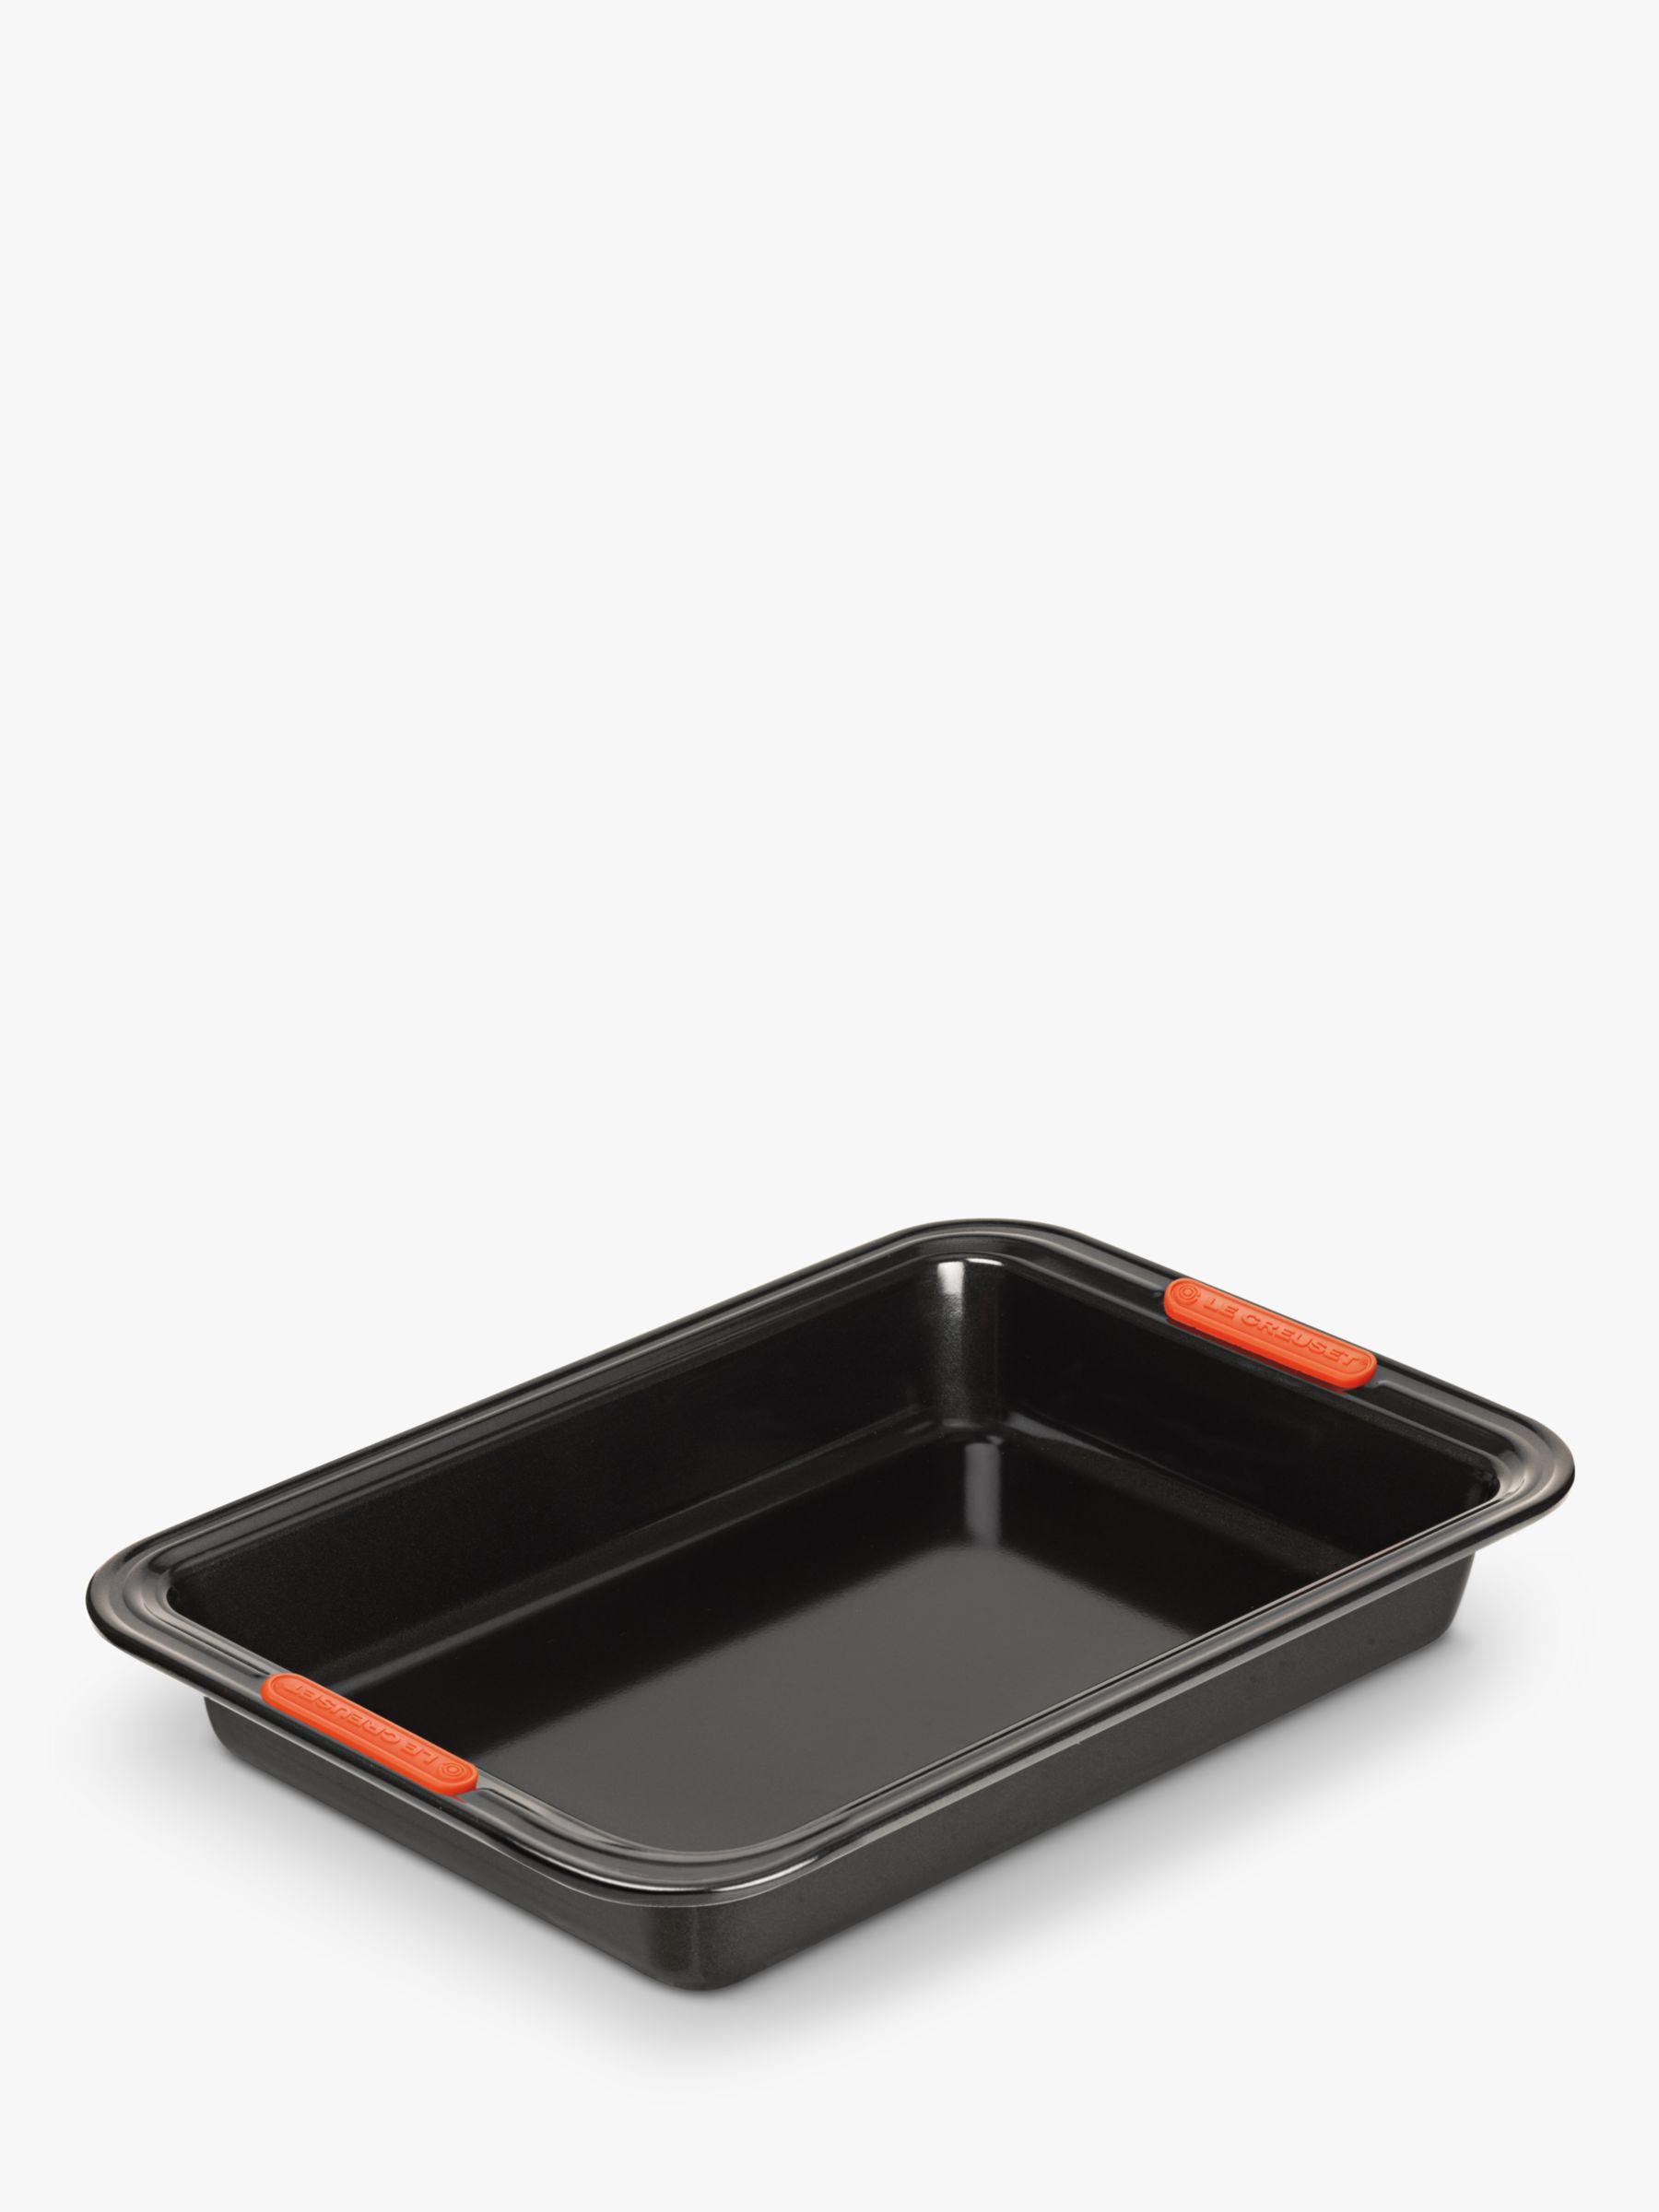 Le Creuset Non-Stick Rectangular Cake Tin Baking Trays, Set of 2, Black